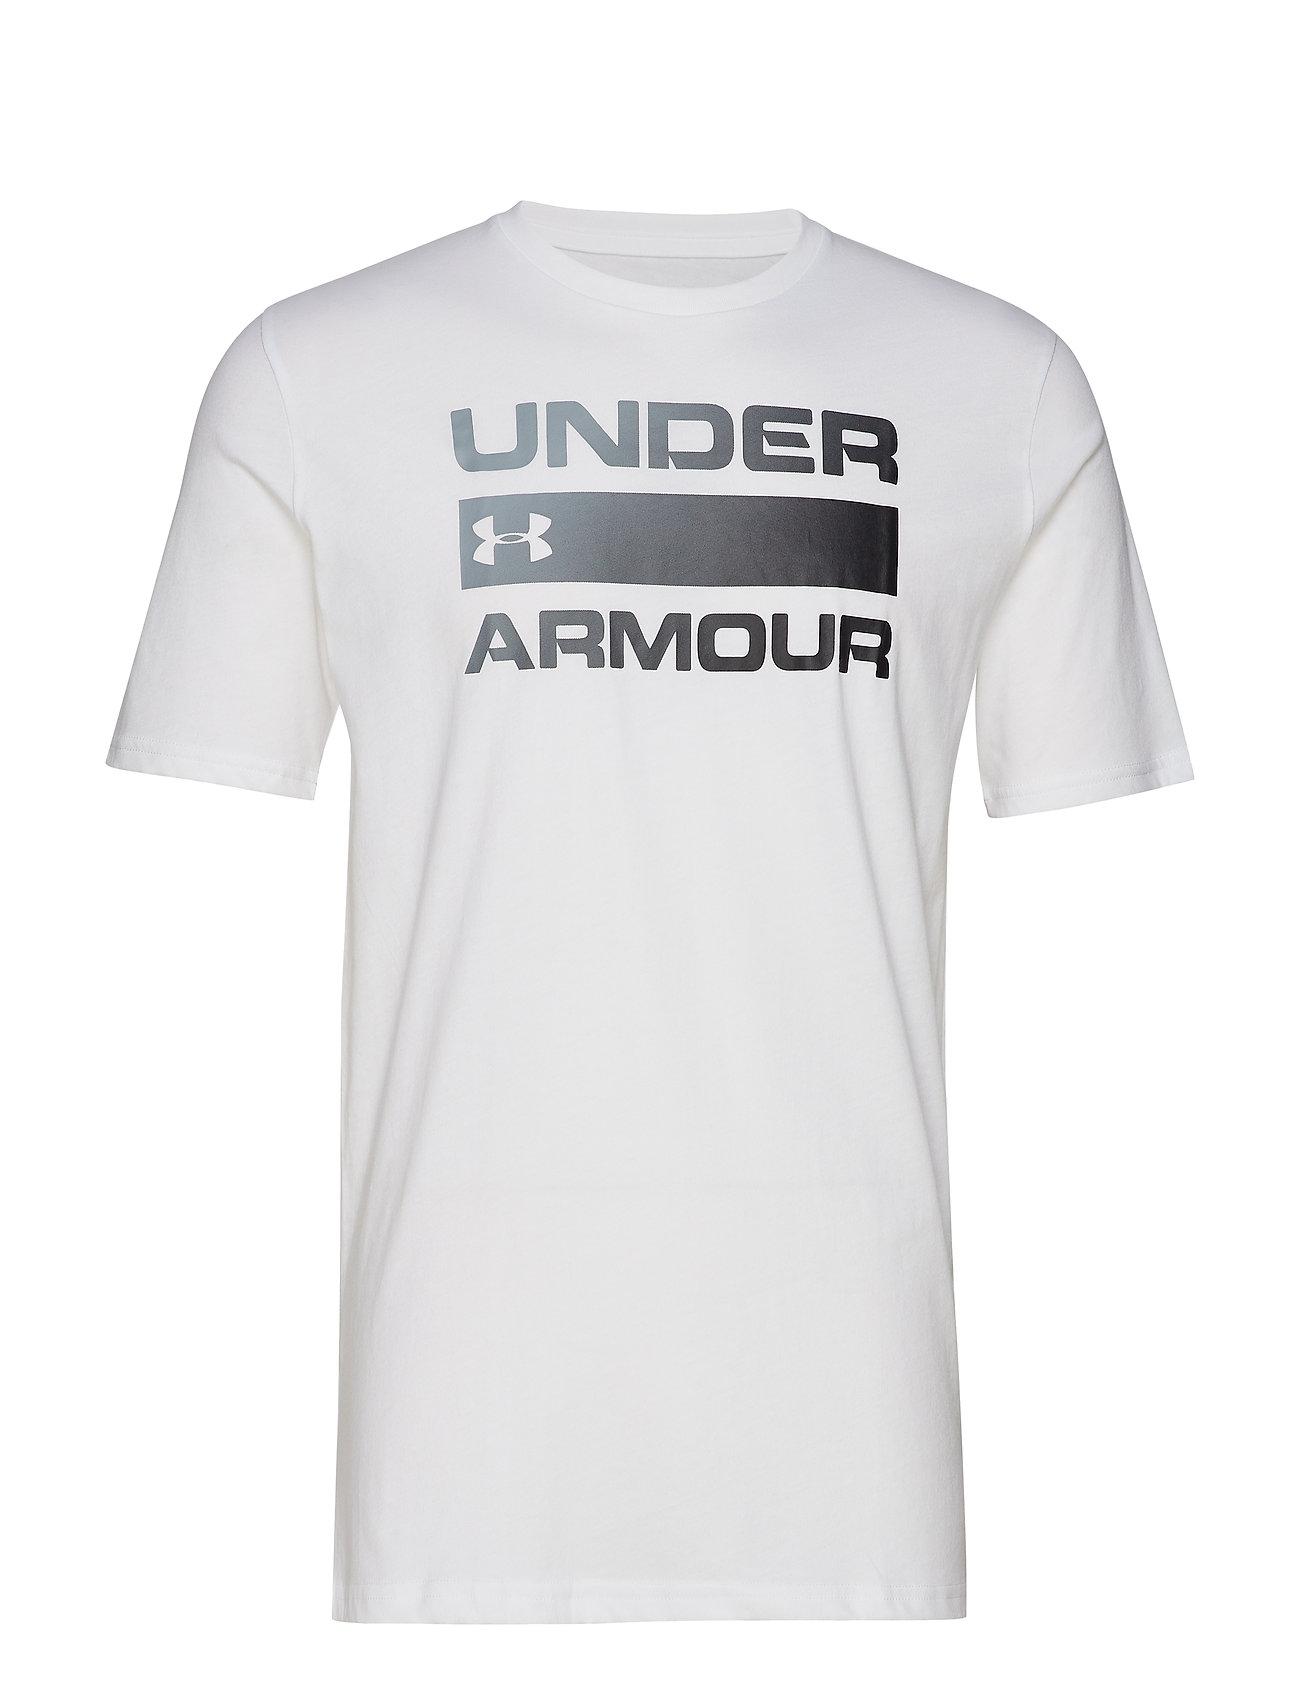 SswhiteUnder Team Issue Armour Wordmark Ua PkZuXi